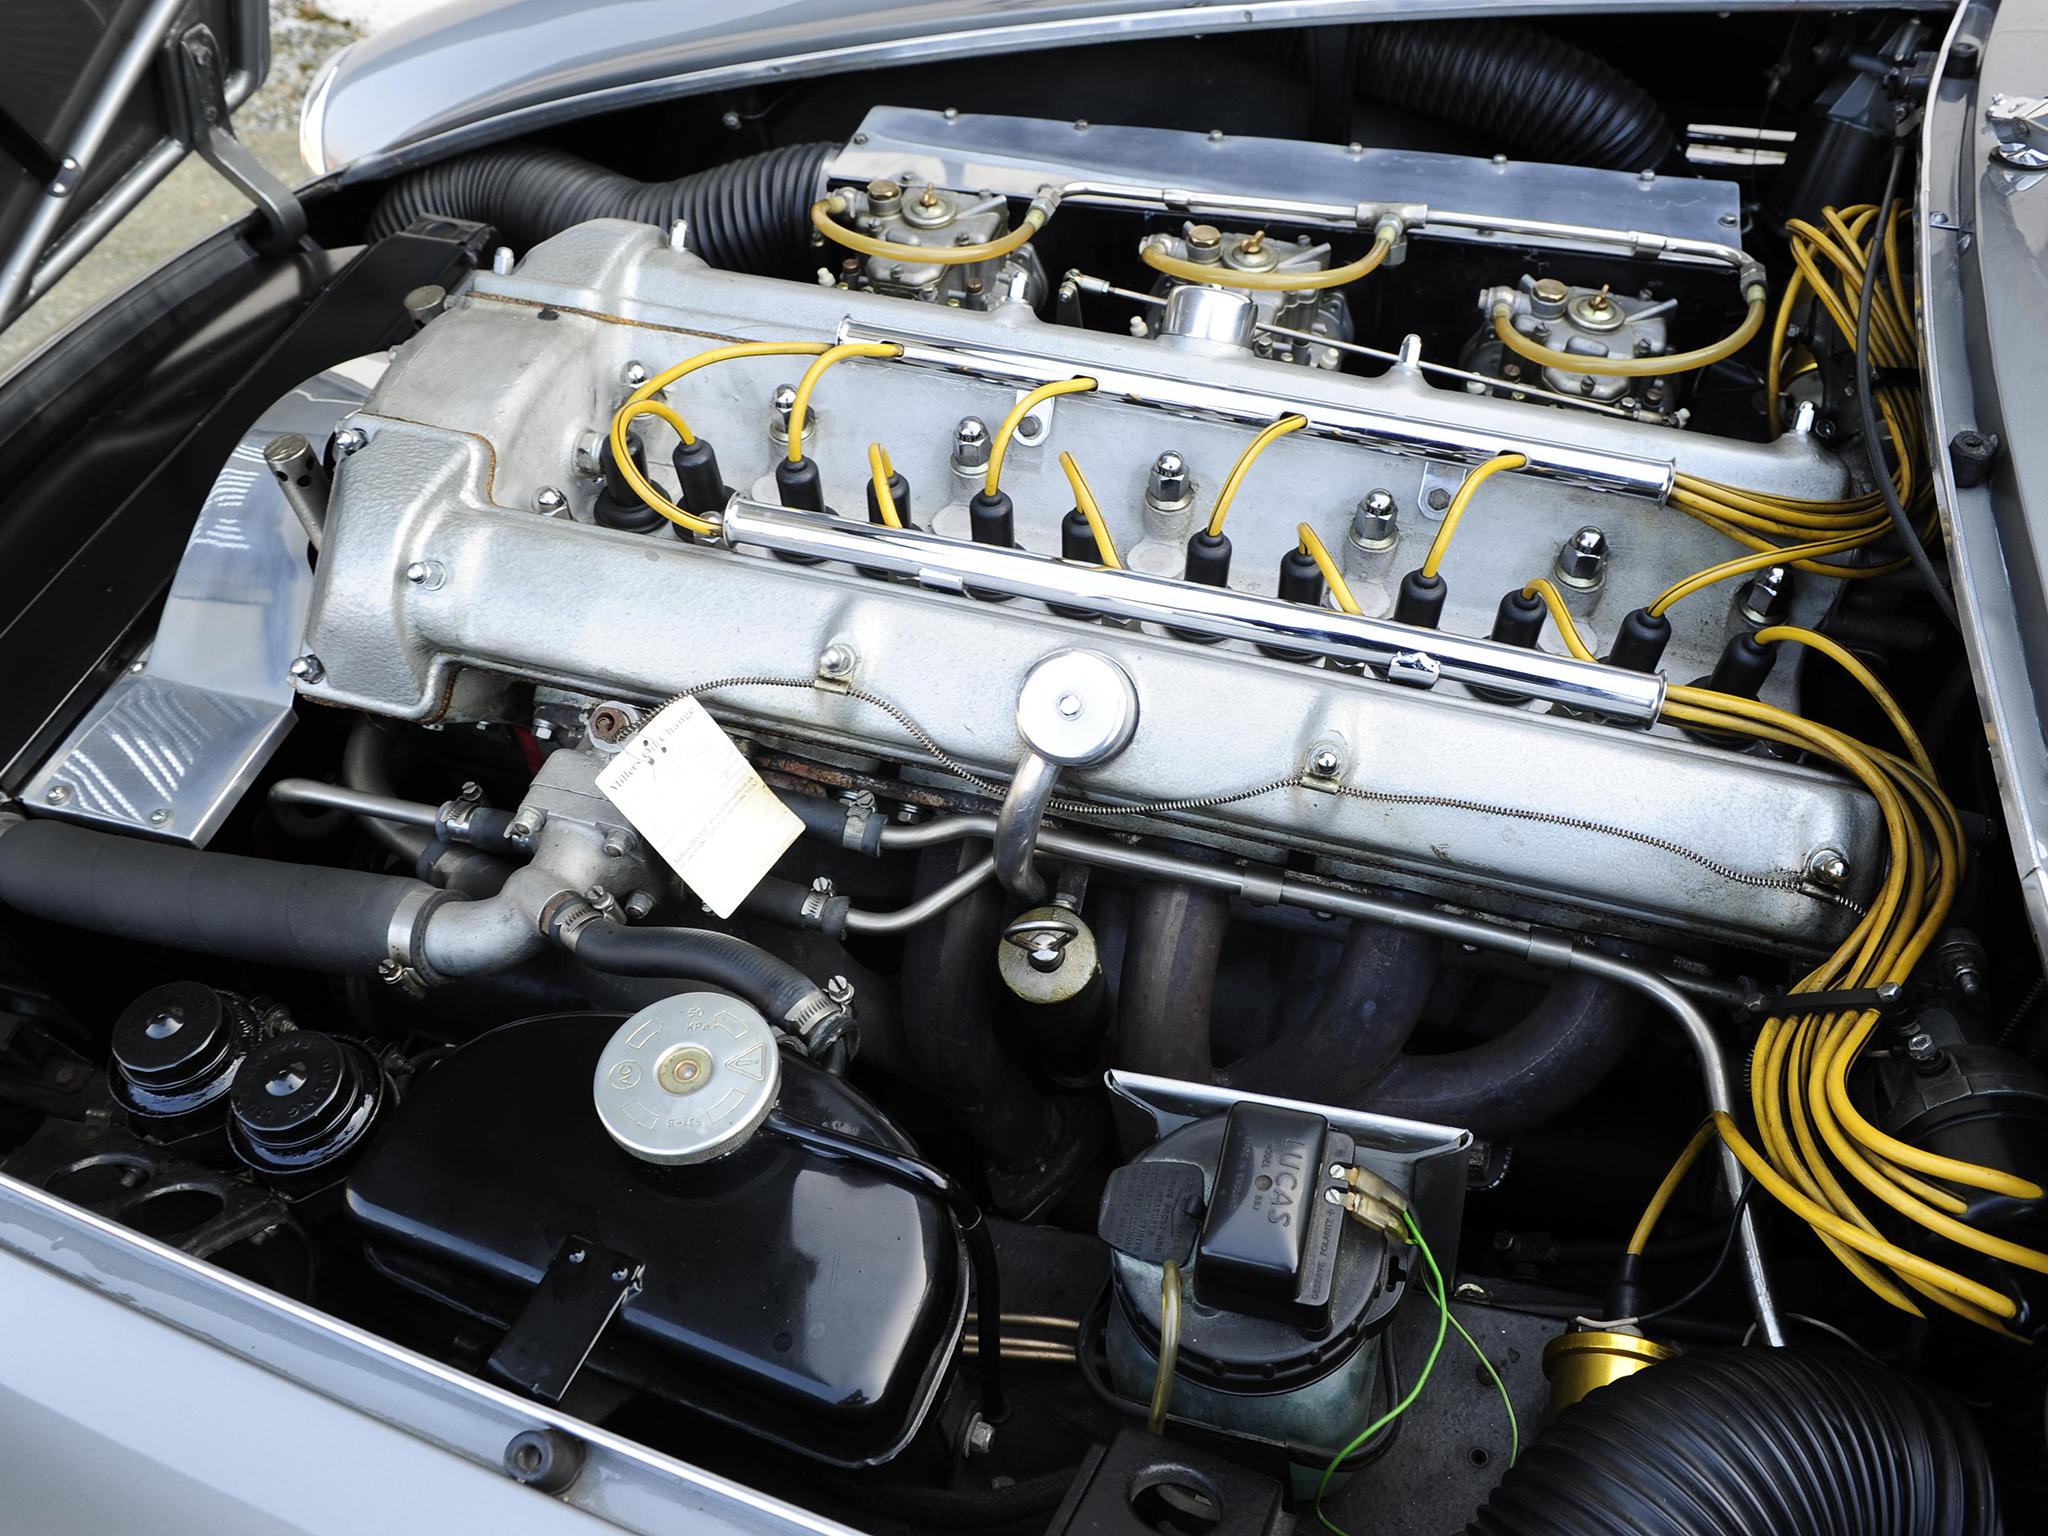 Aston Martin DB4 GT Bertone Jet двигатель